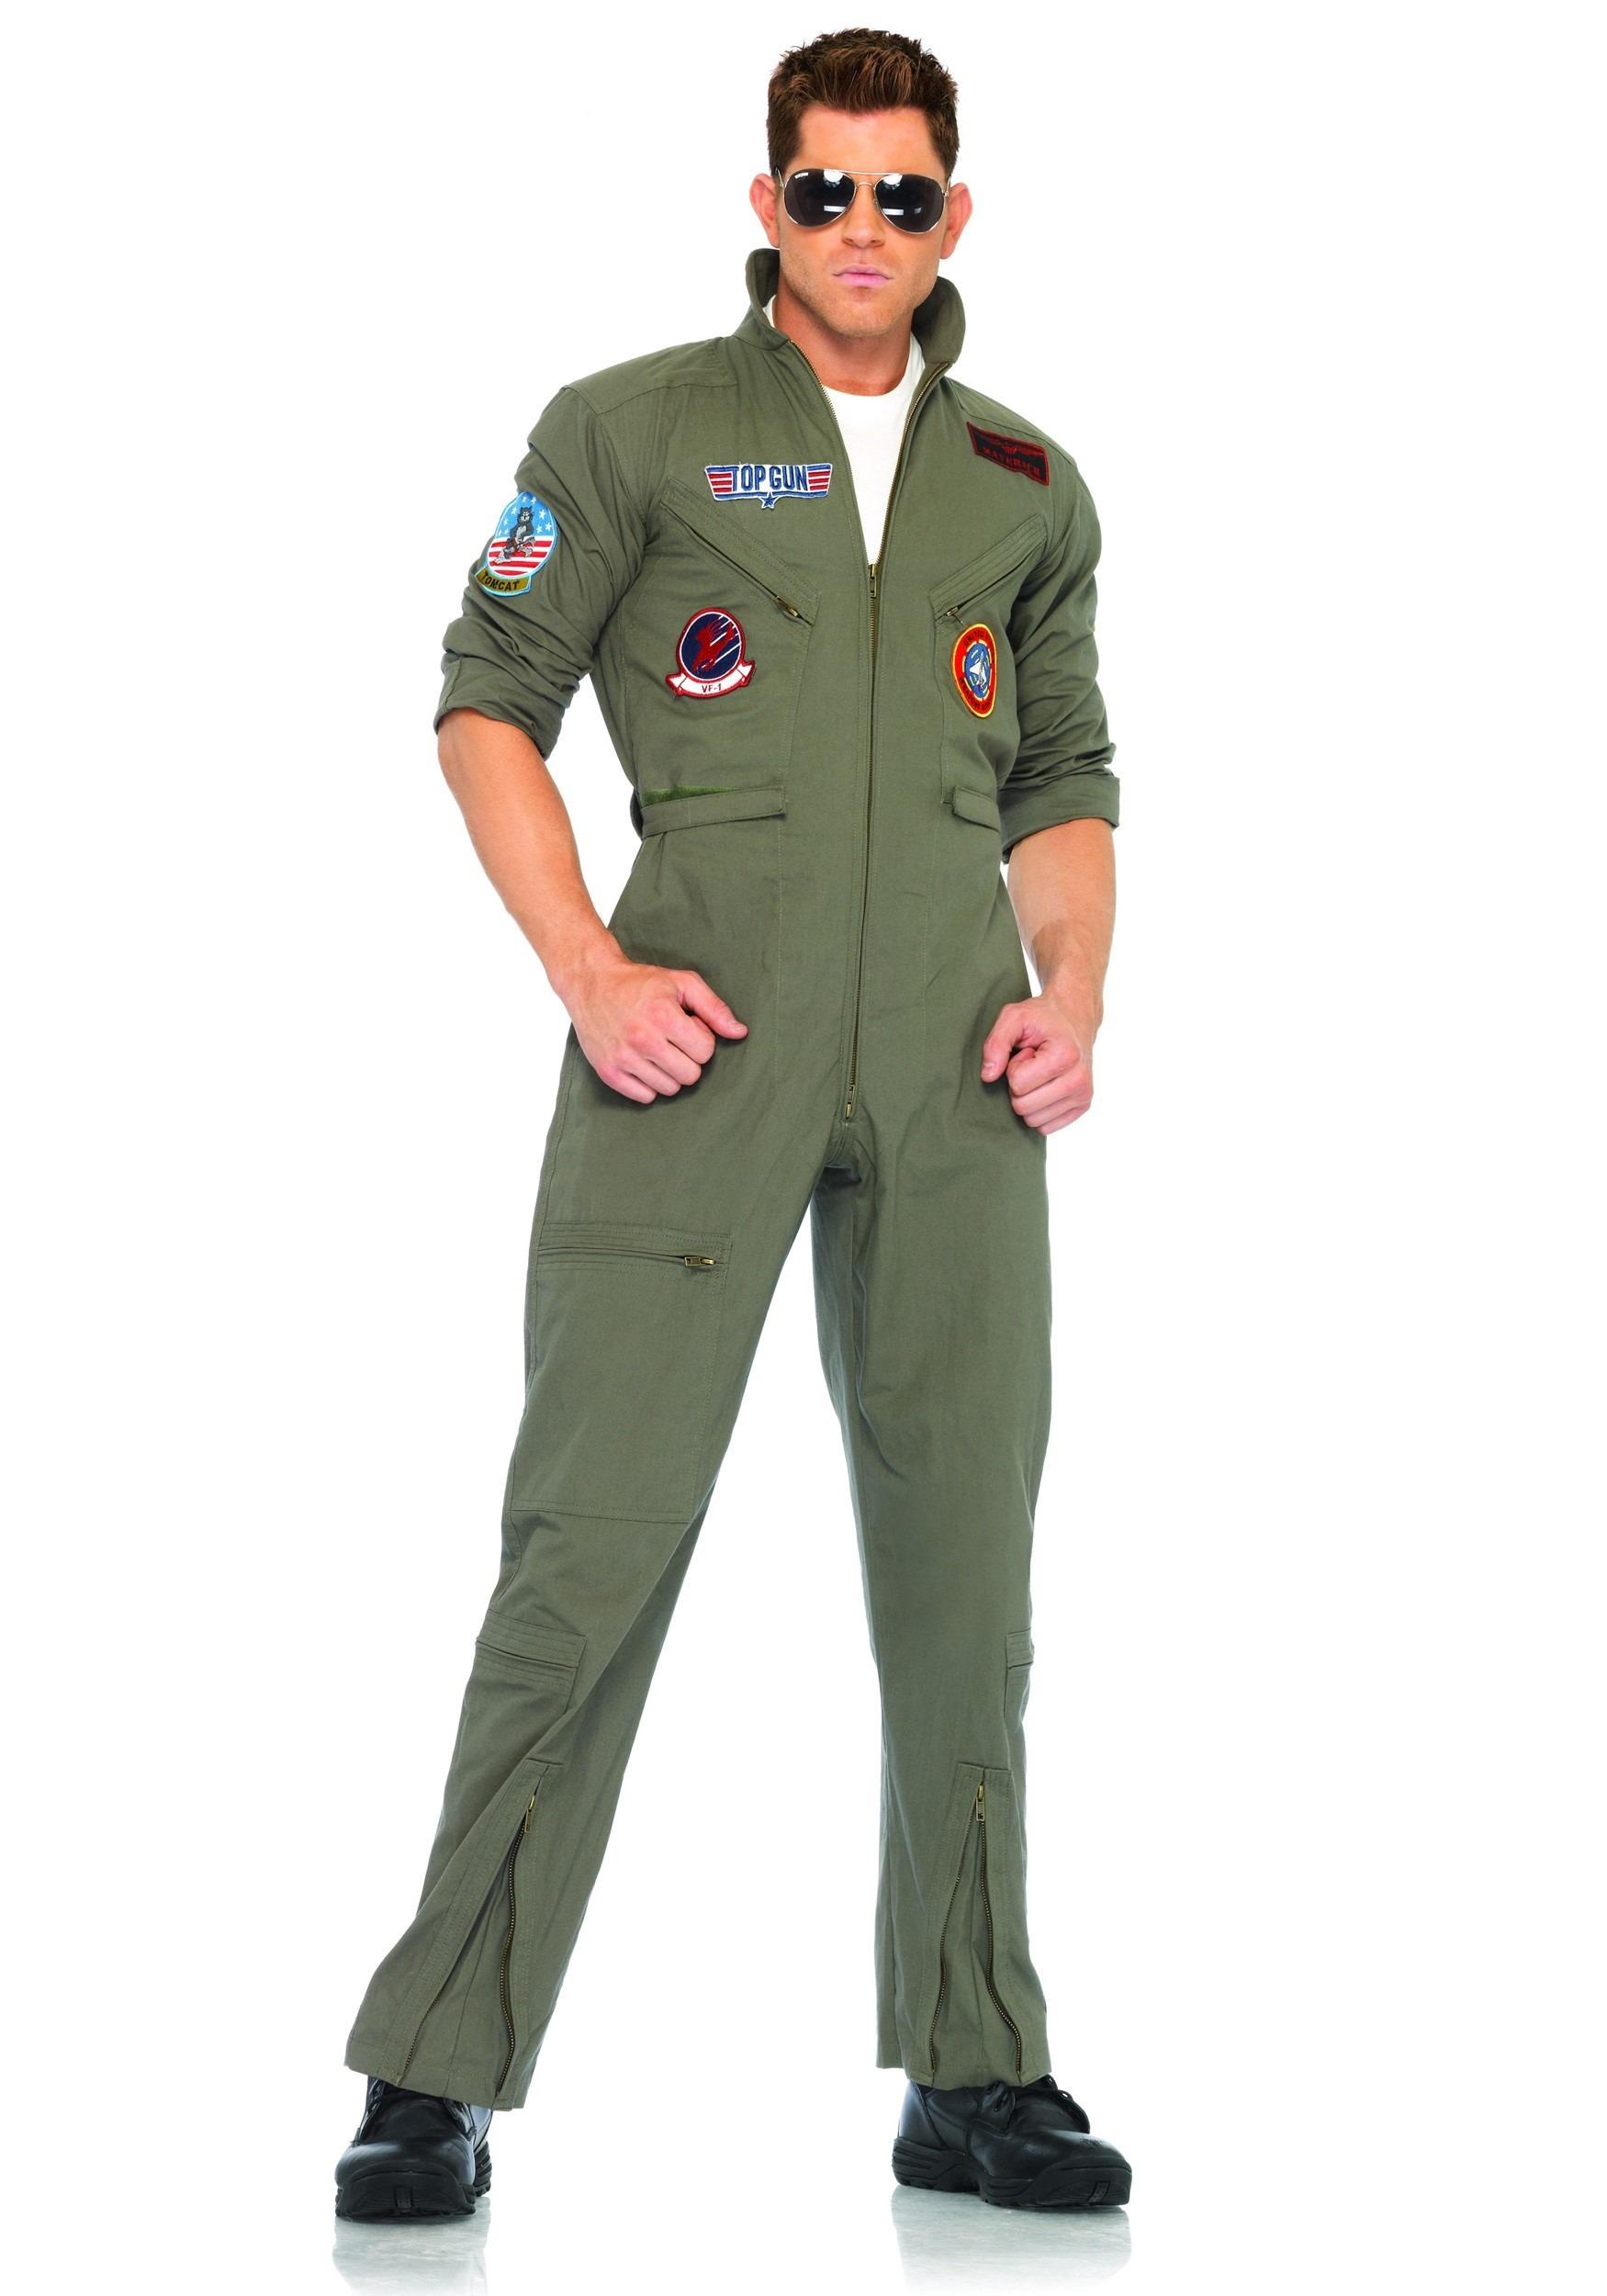 mens top gun flight suit costume